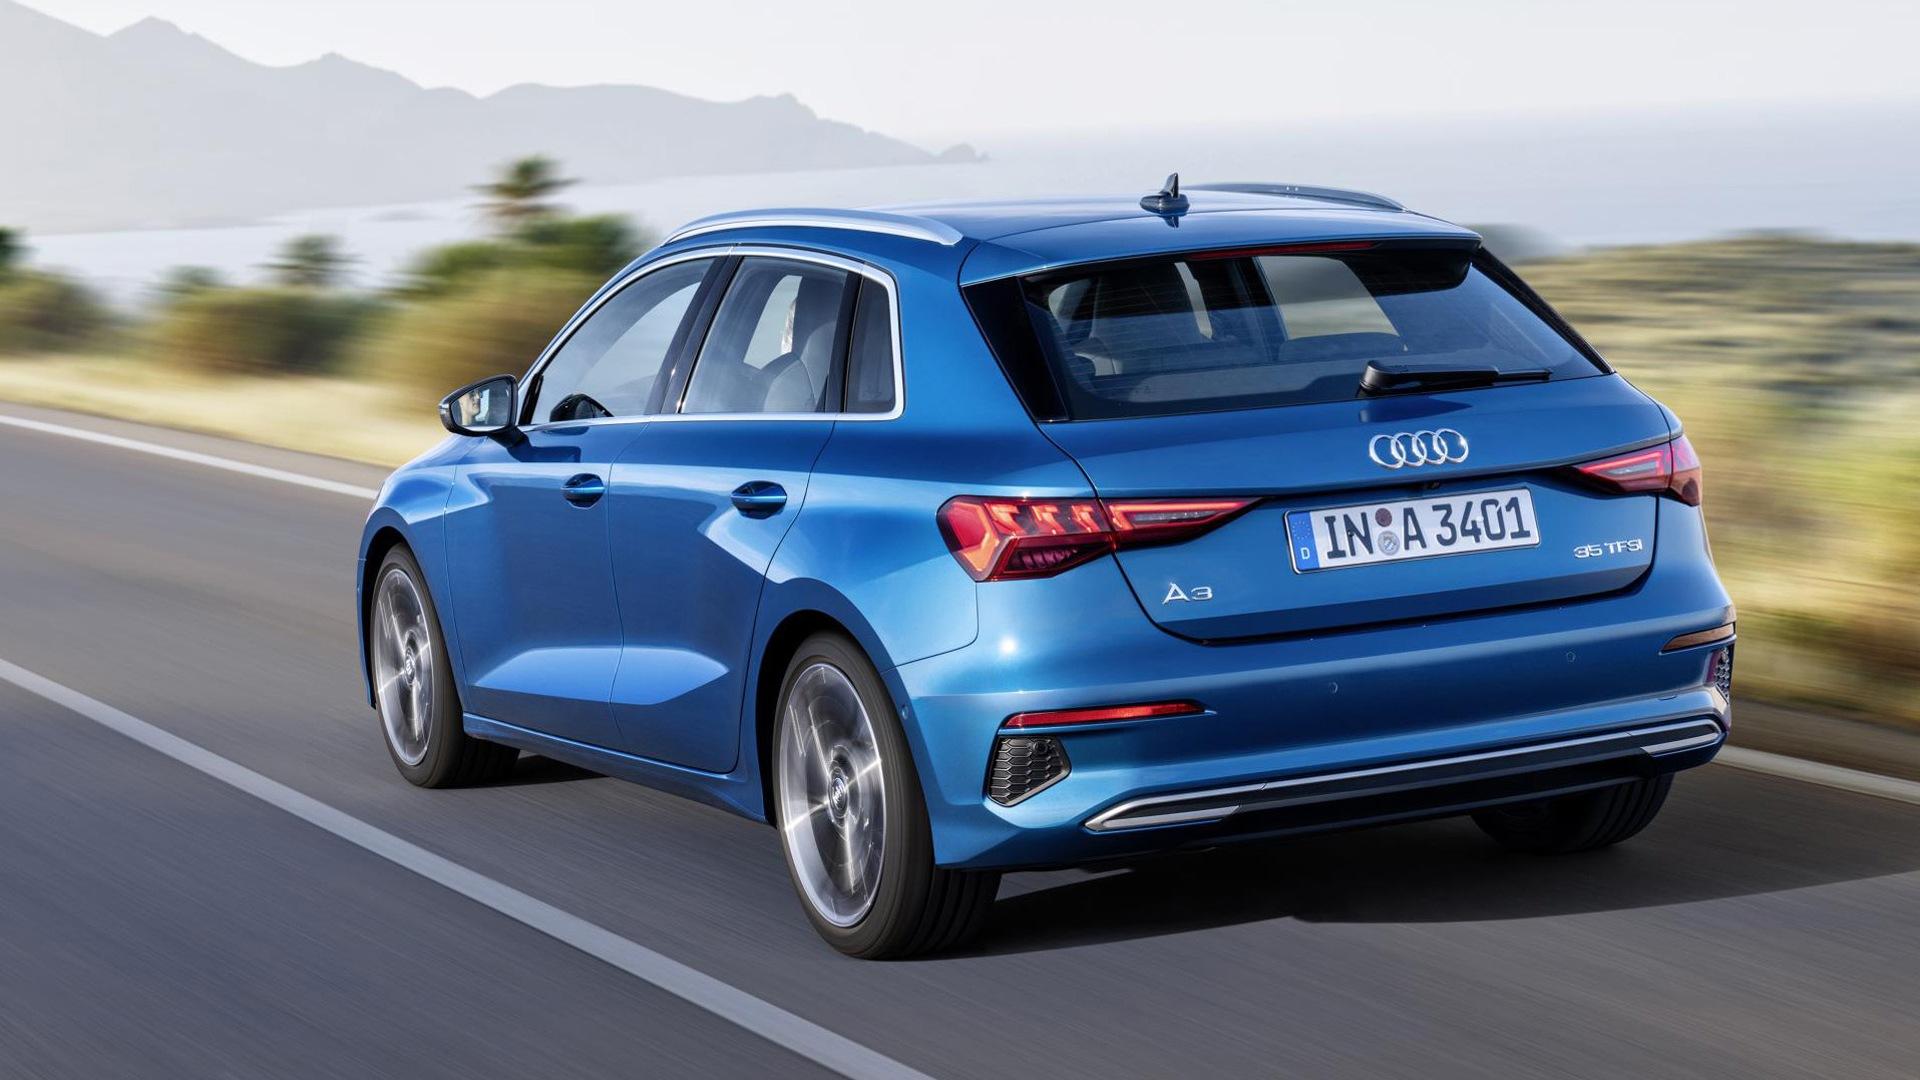 2021 Audi A3 revealed in Sportback body style